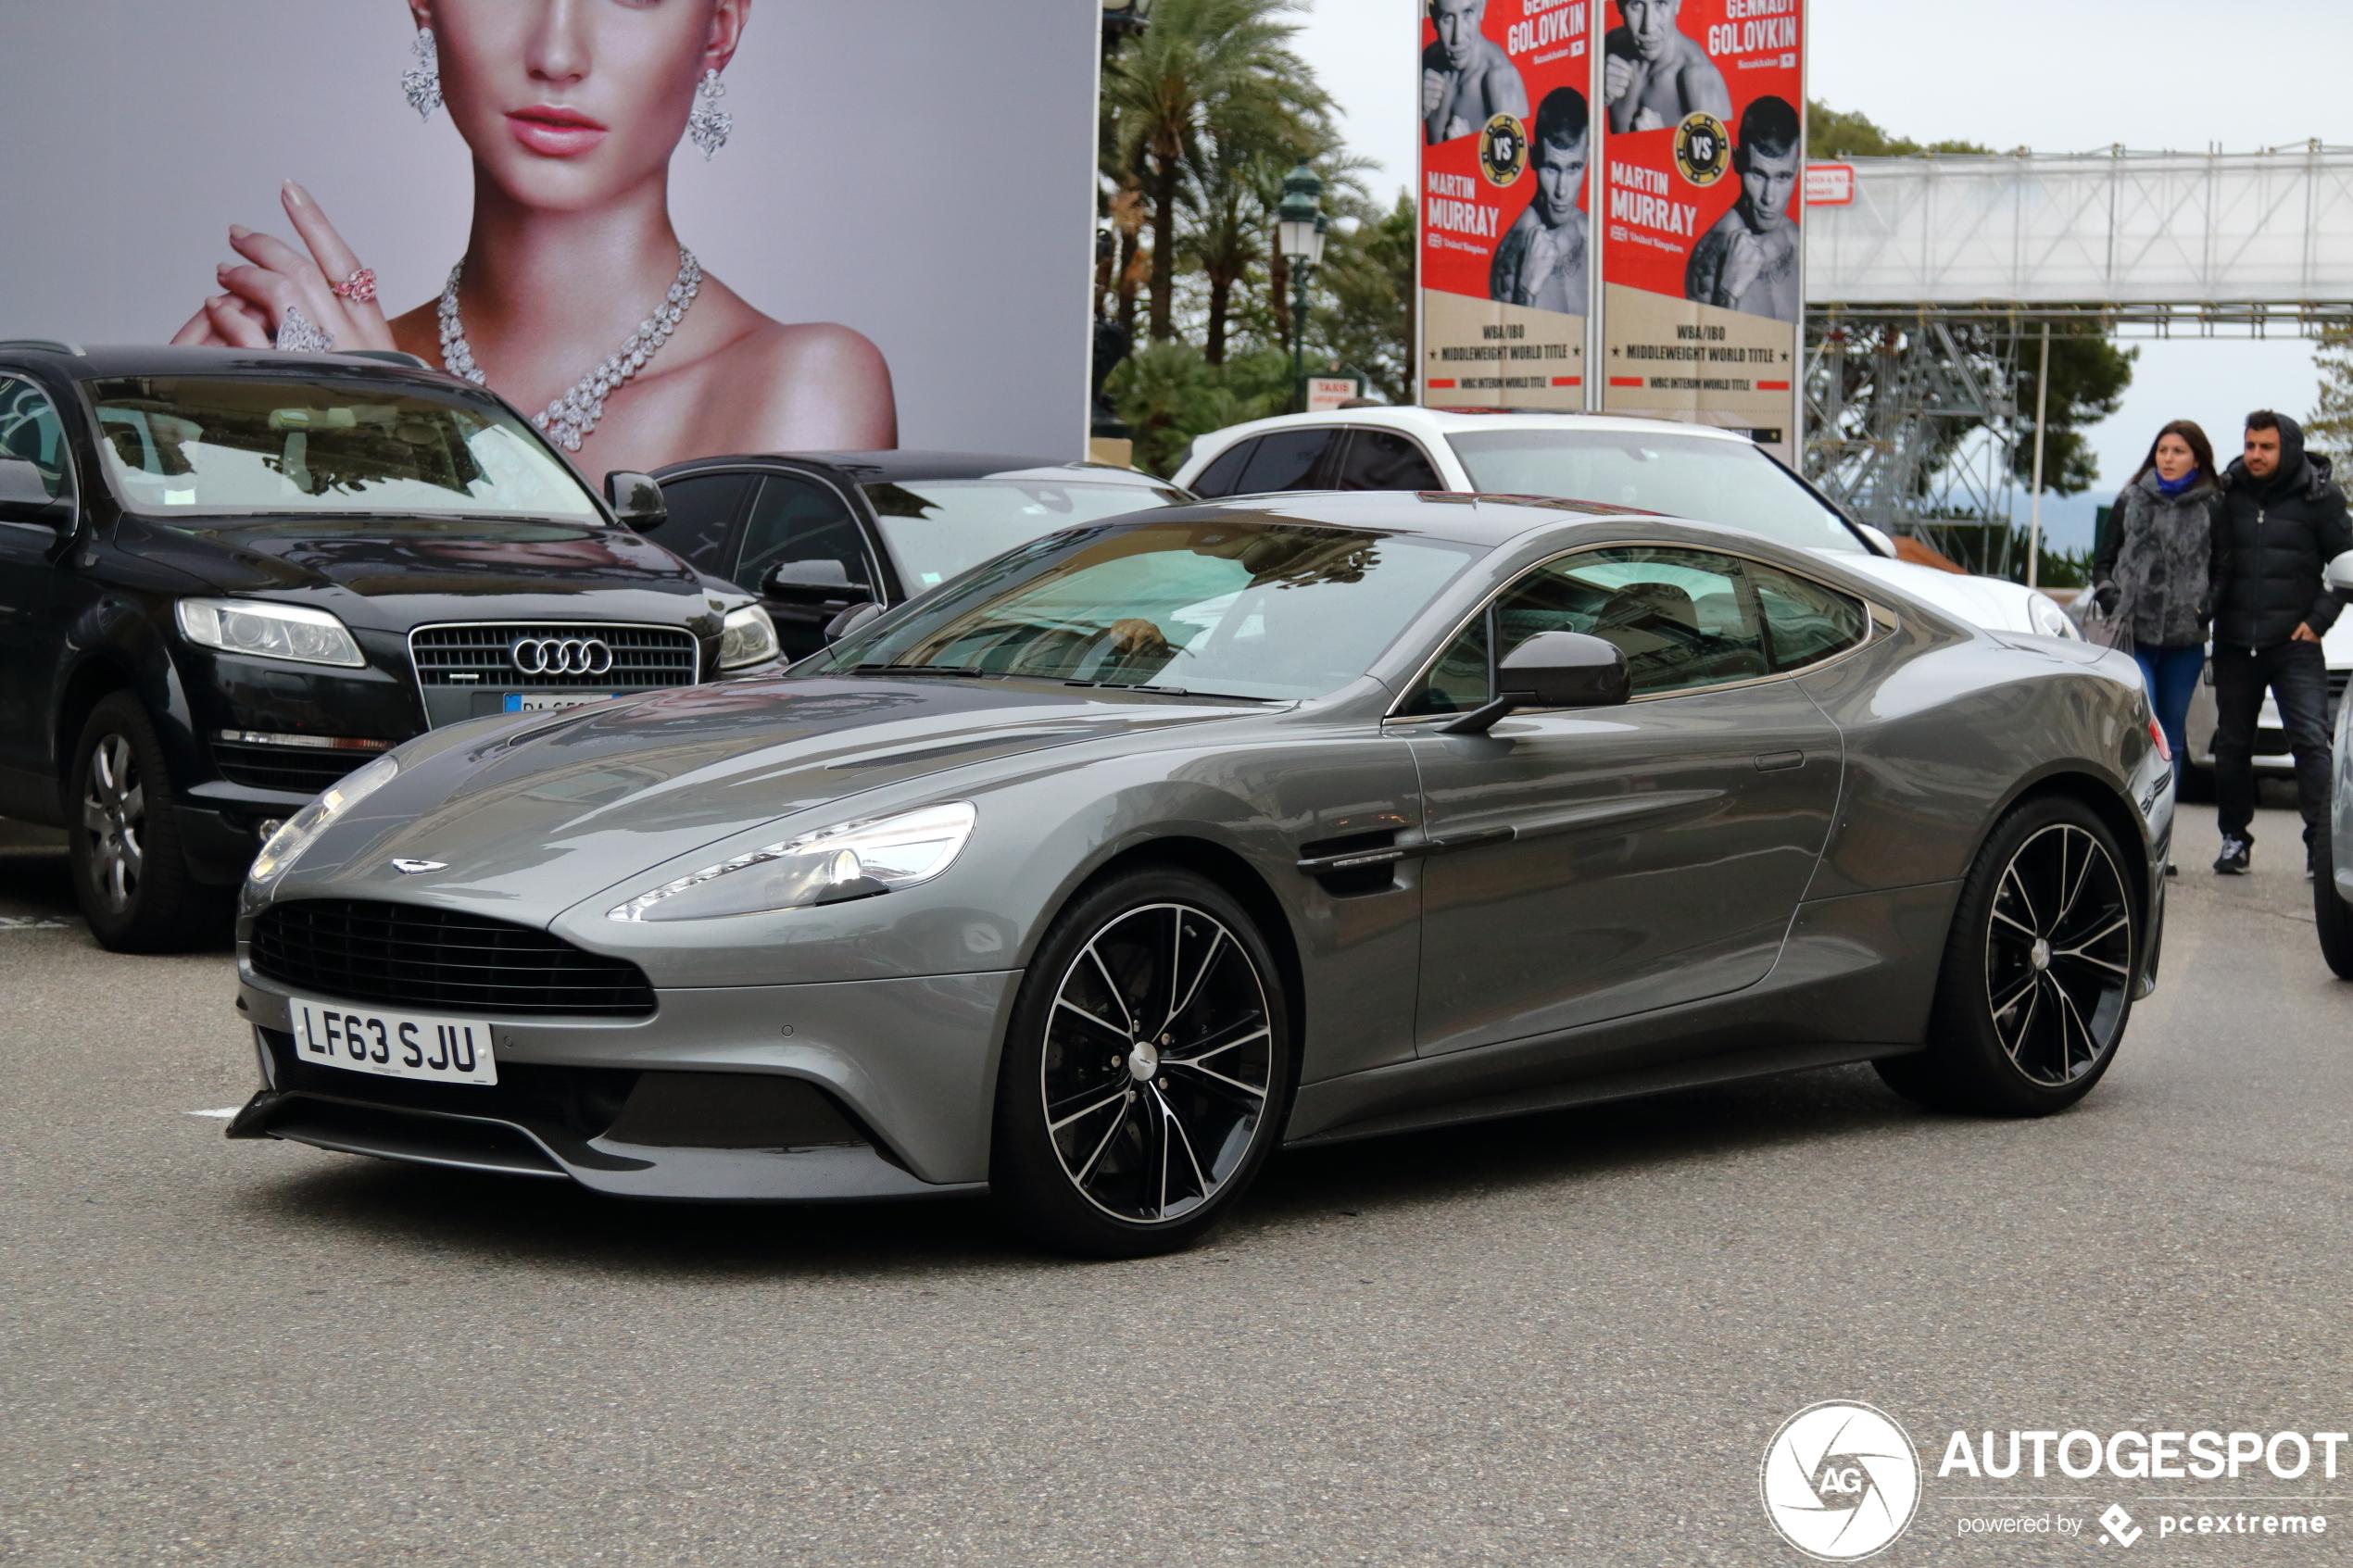 Aston Martin Vanquish 2013 17 May 2020 Autogespot